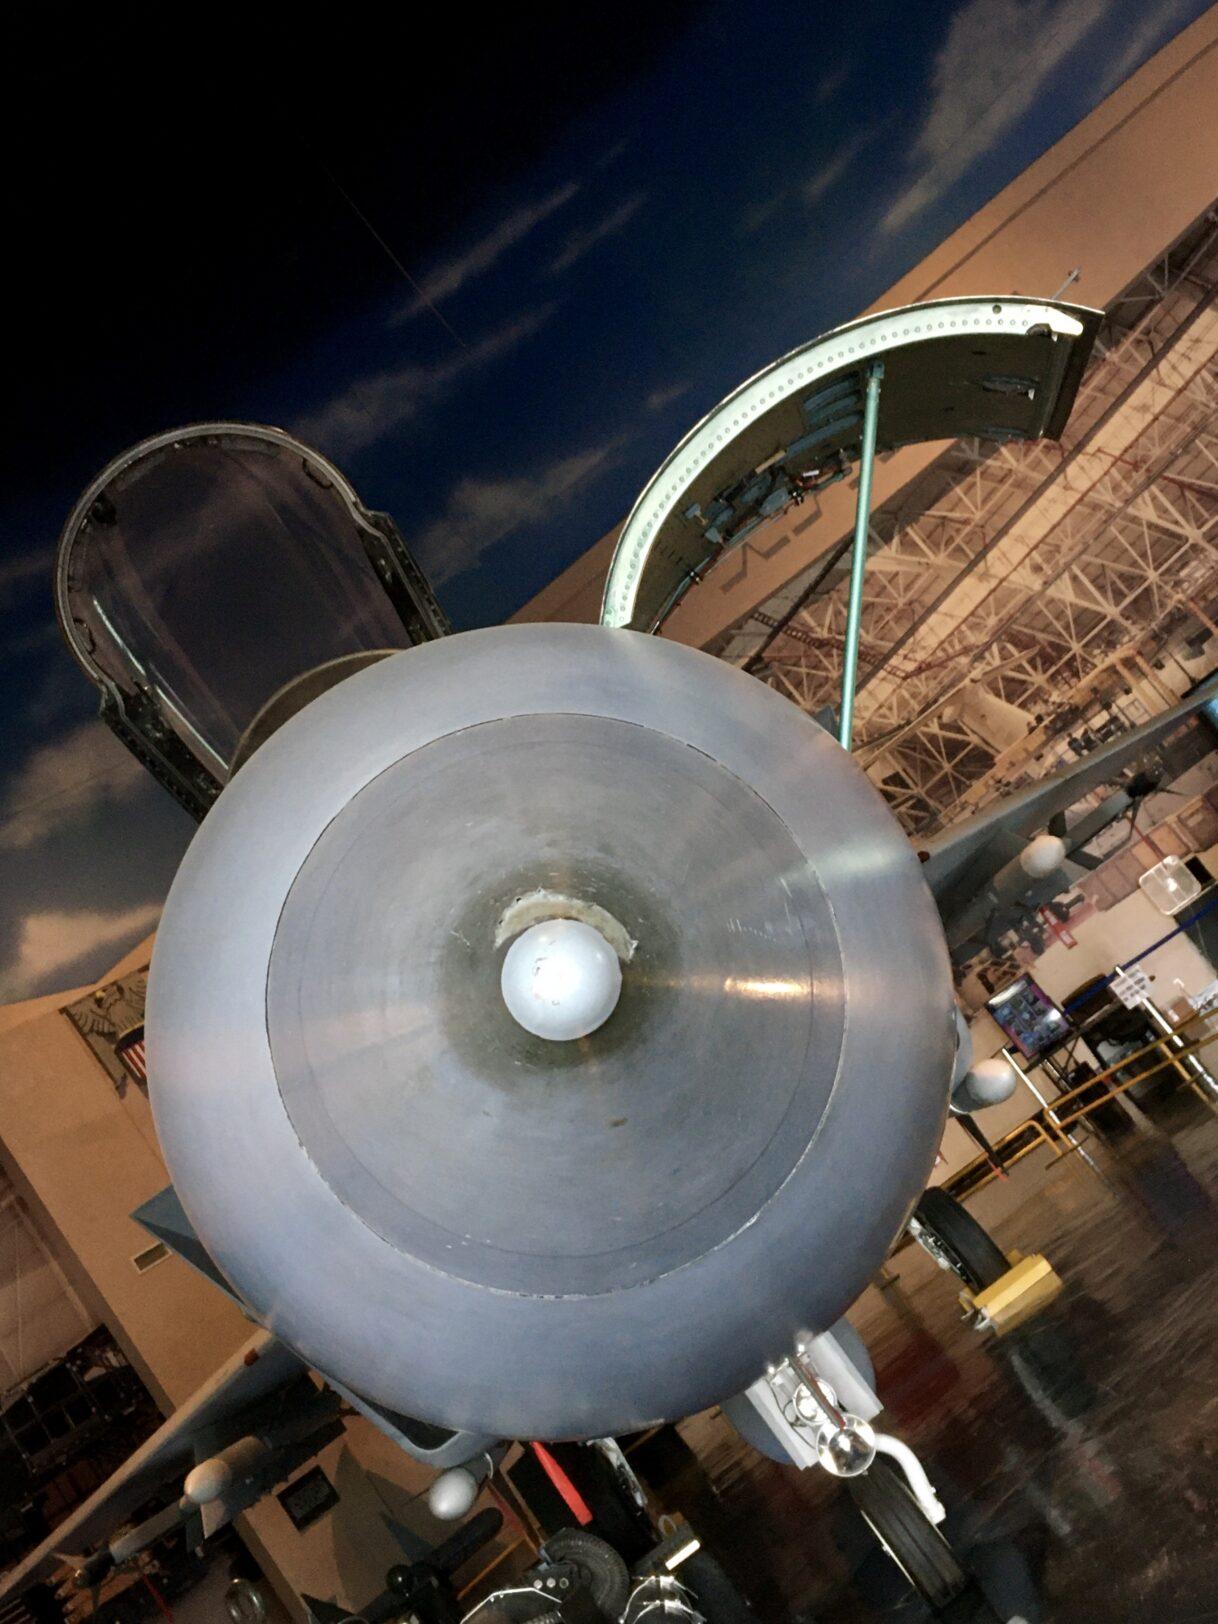 Museum of Aviation – Main Indoor Exhibits – Warner Robins Air Force Base – Warner Robins, Georgia – 05/04/2021